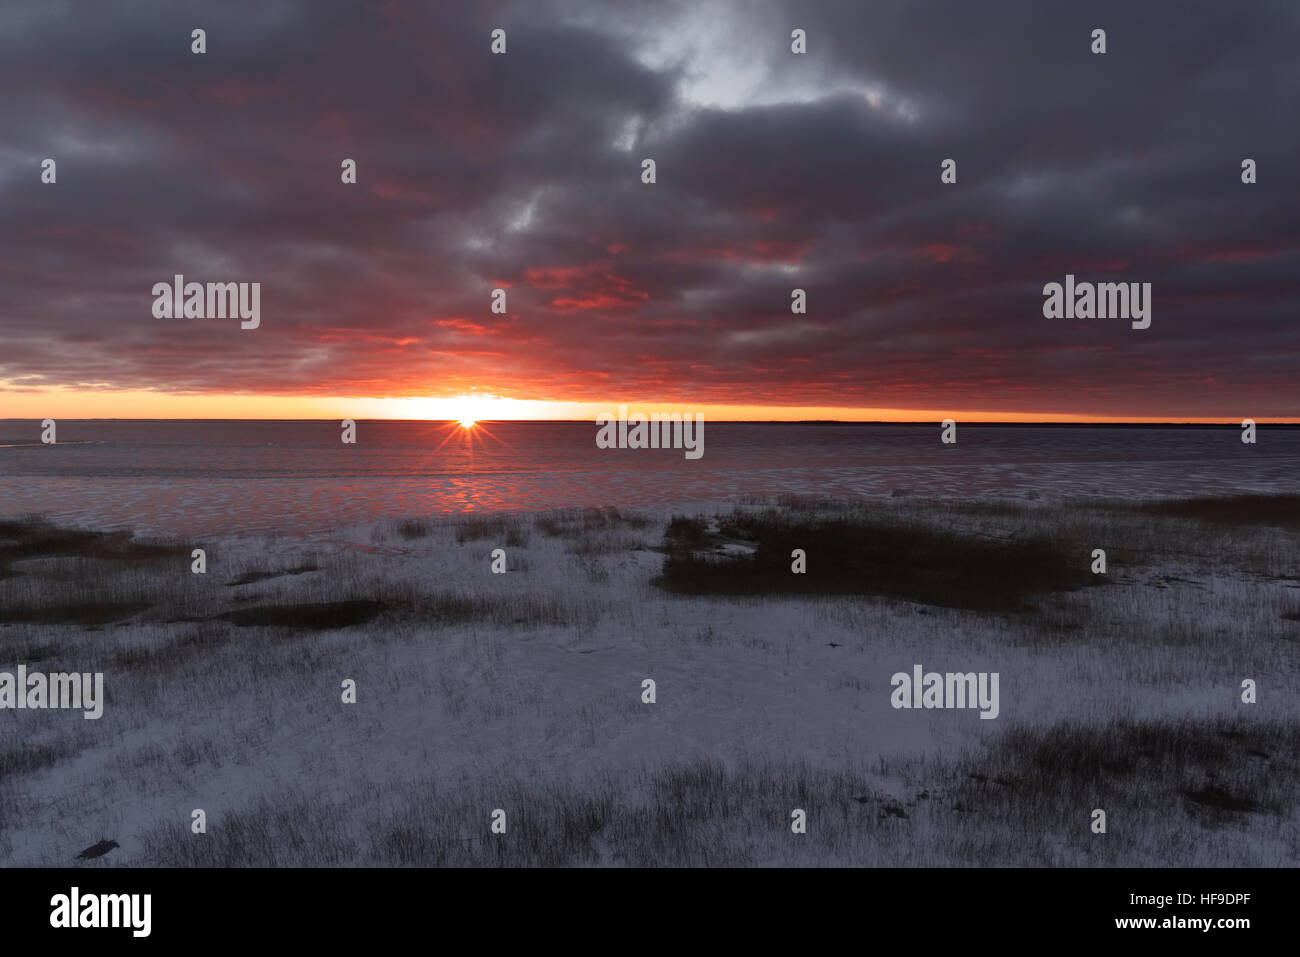 Evening Landscape, Lake Võrtsjärv, Estonia 28.12.2016 - Stock Image